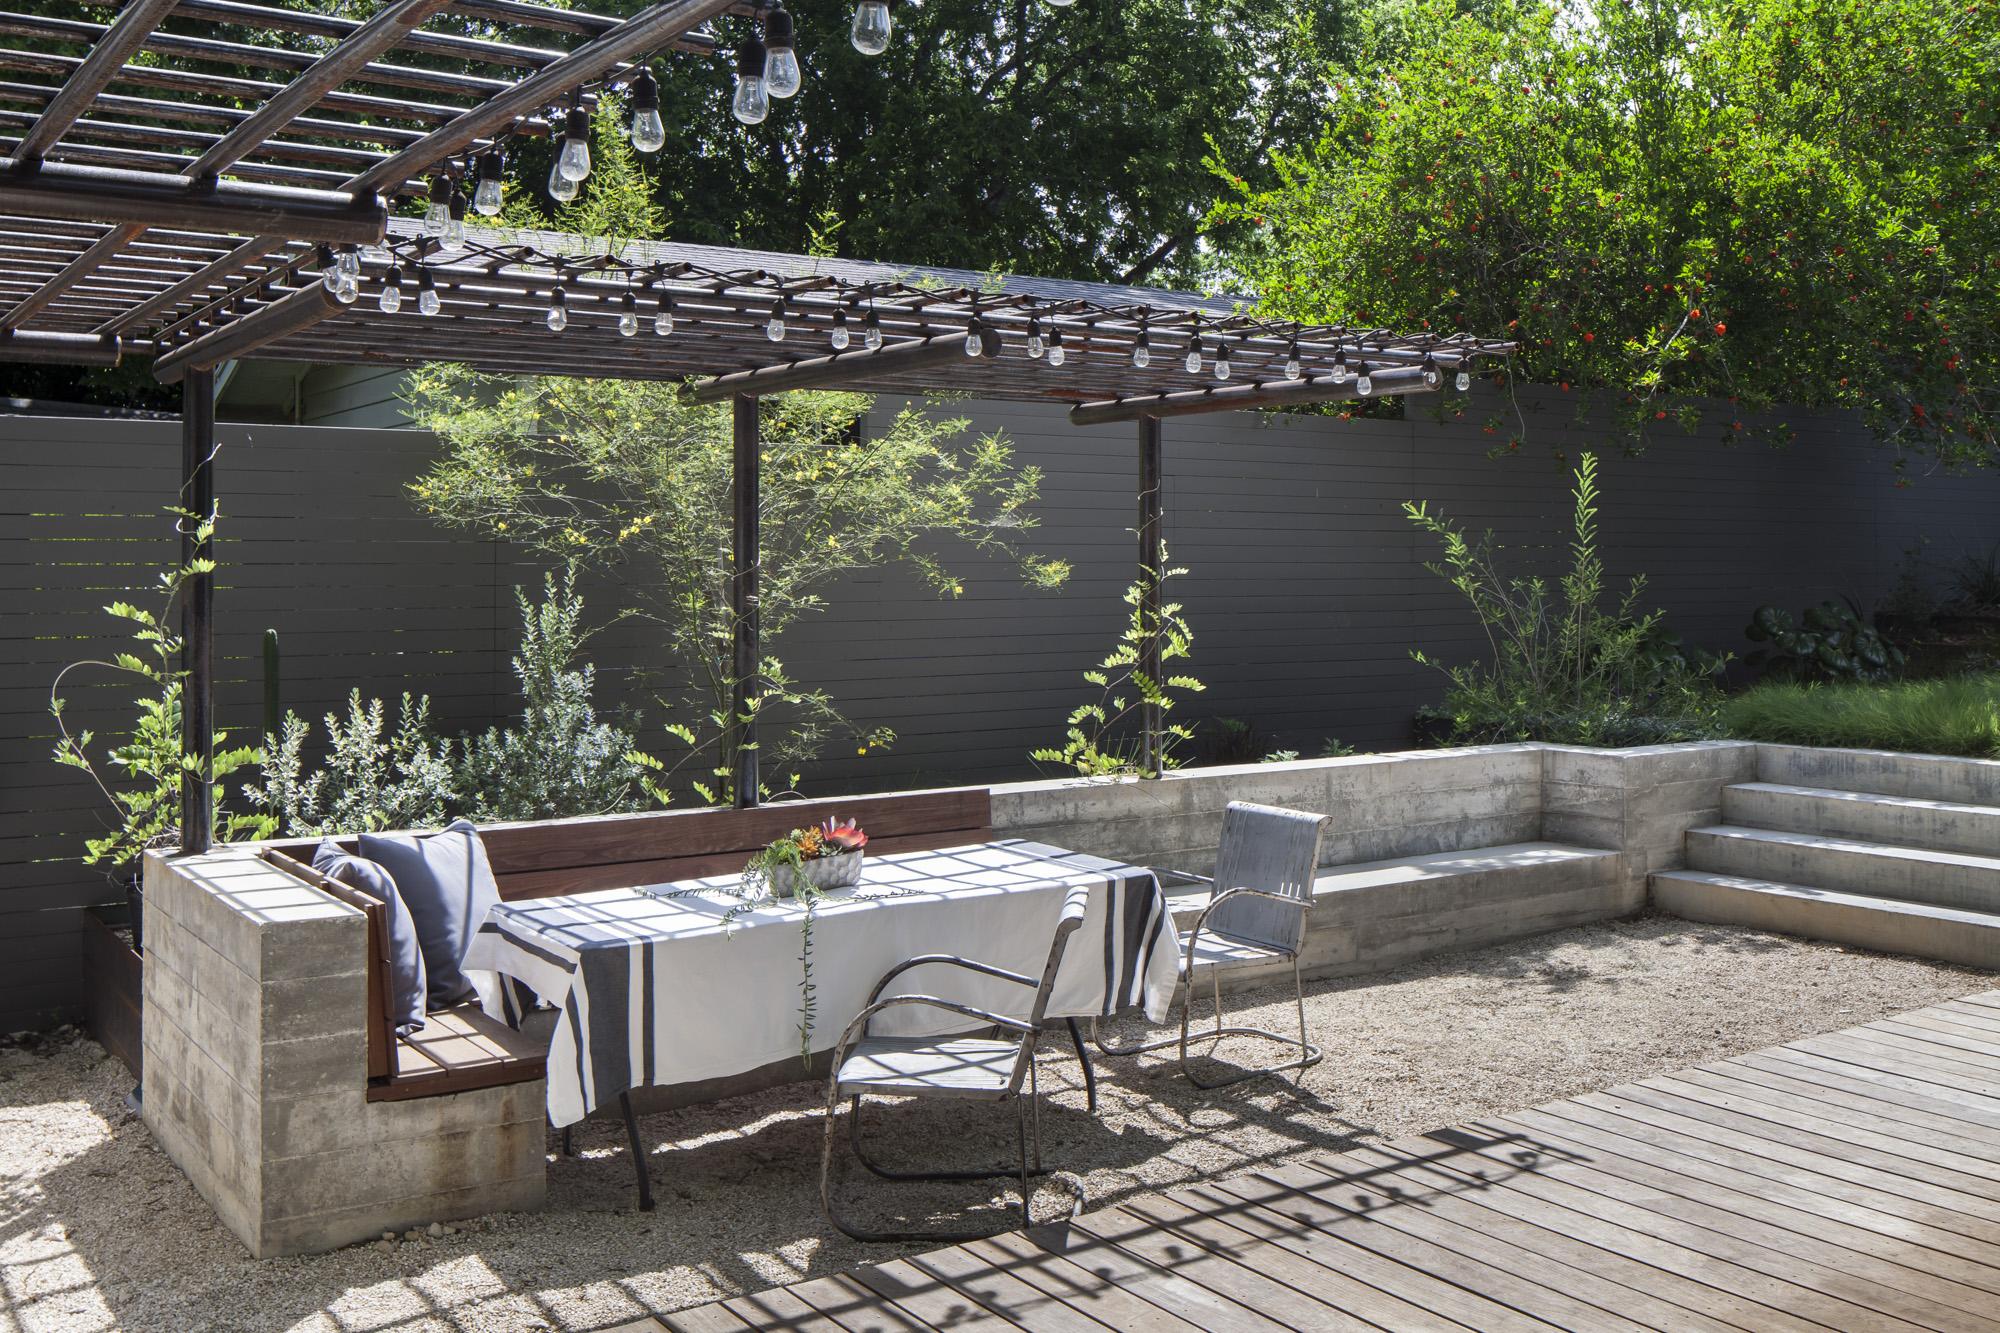 Elizabeth-Baird-Architecture-Garner Pool and Casita- seating area.jpg